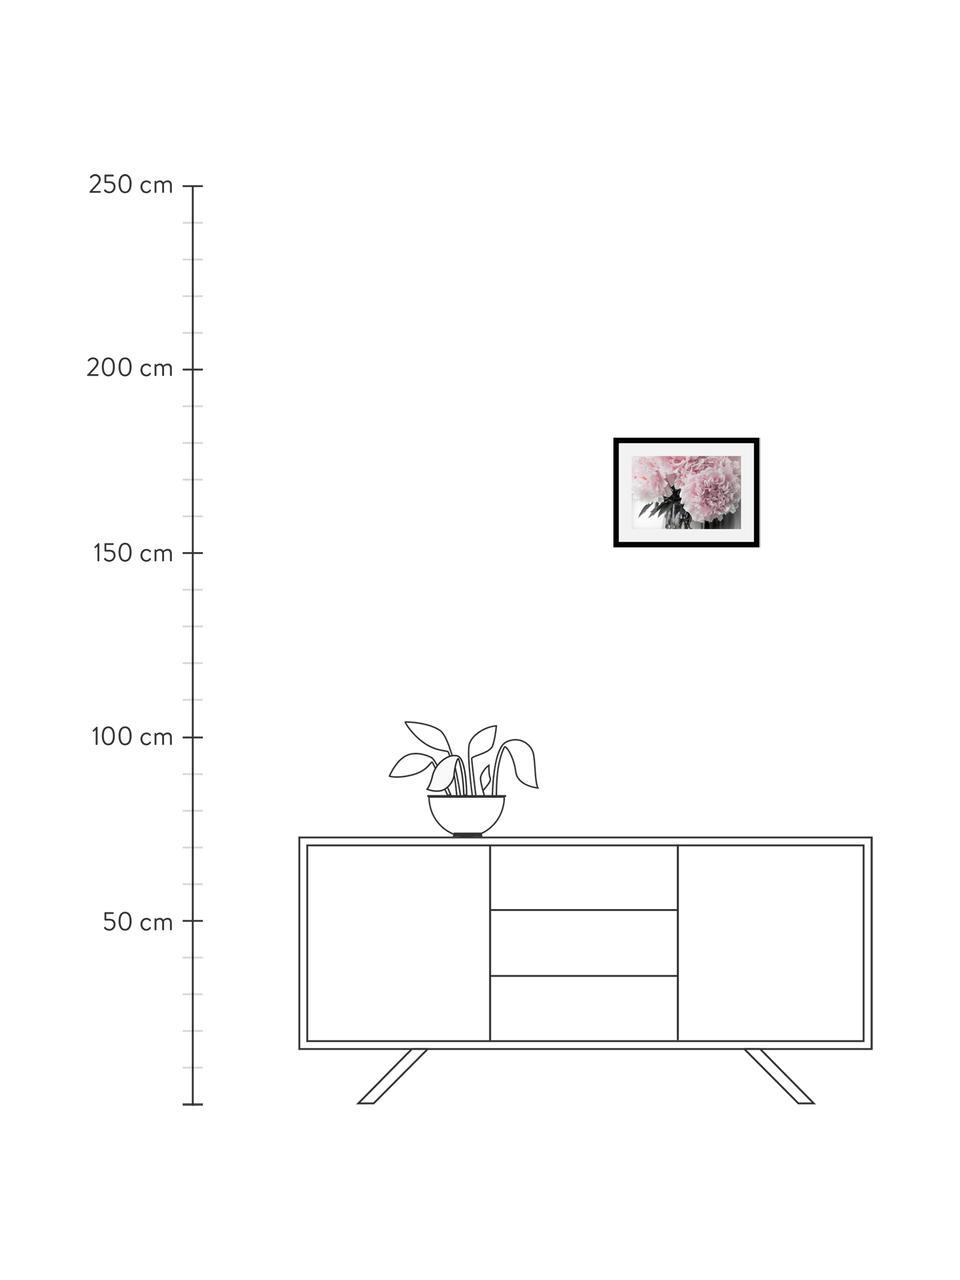 Stampa digitale incorniciata Pink Flowers, Immagine: stampa digitale, Cornice: struttura di legno reale, Immagine: rosa, bianco, verde scuro Cornice: nero, L 40 cm x A 30 cm